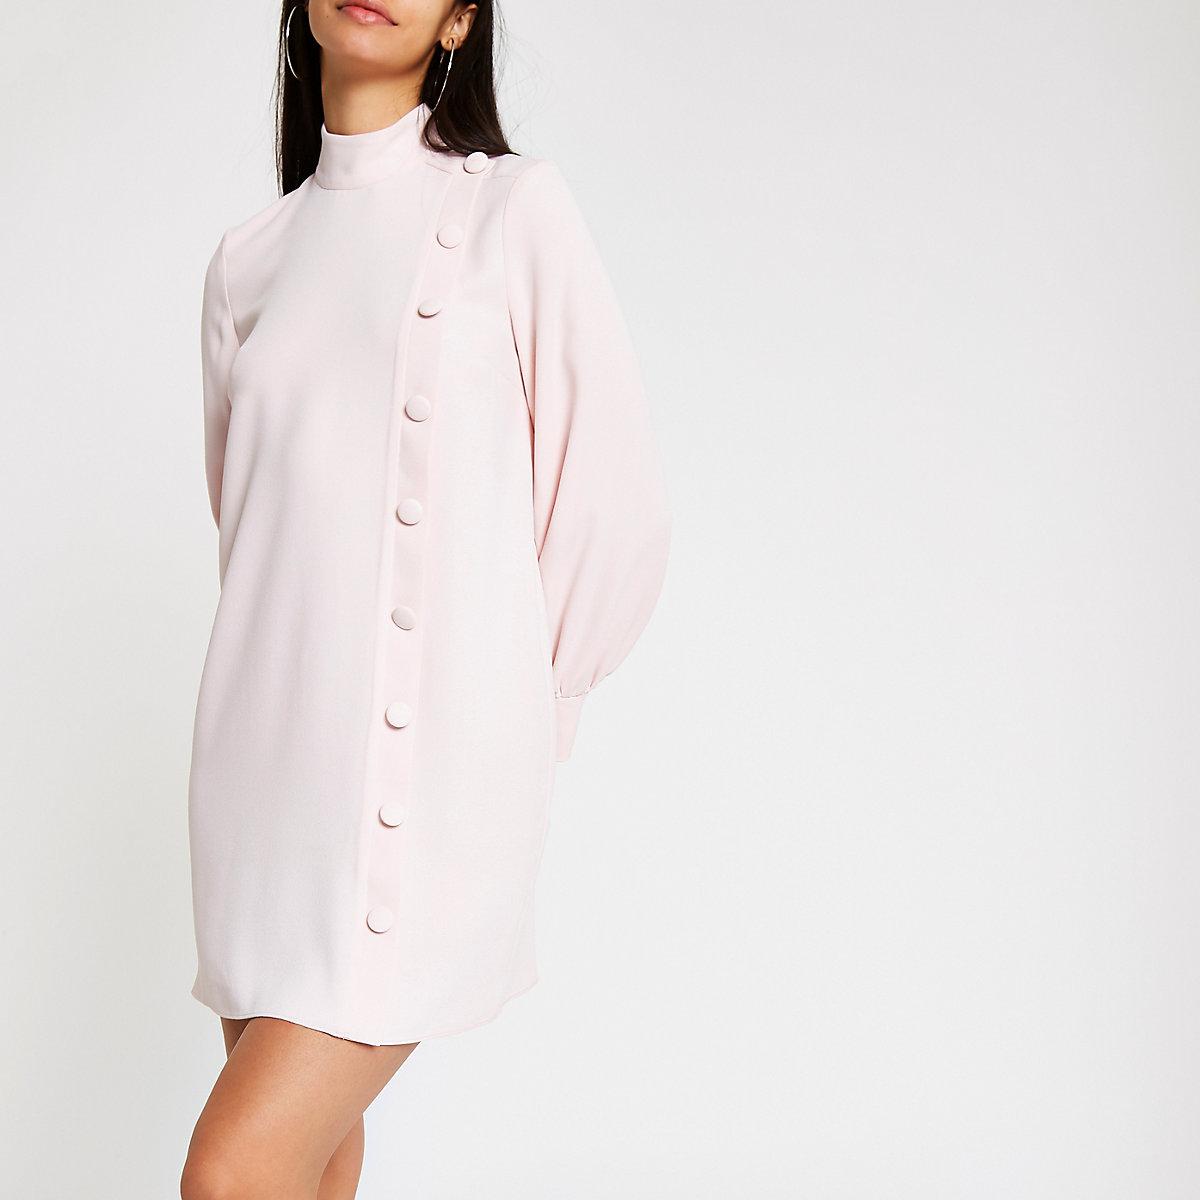 Light pink button front swing dress